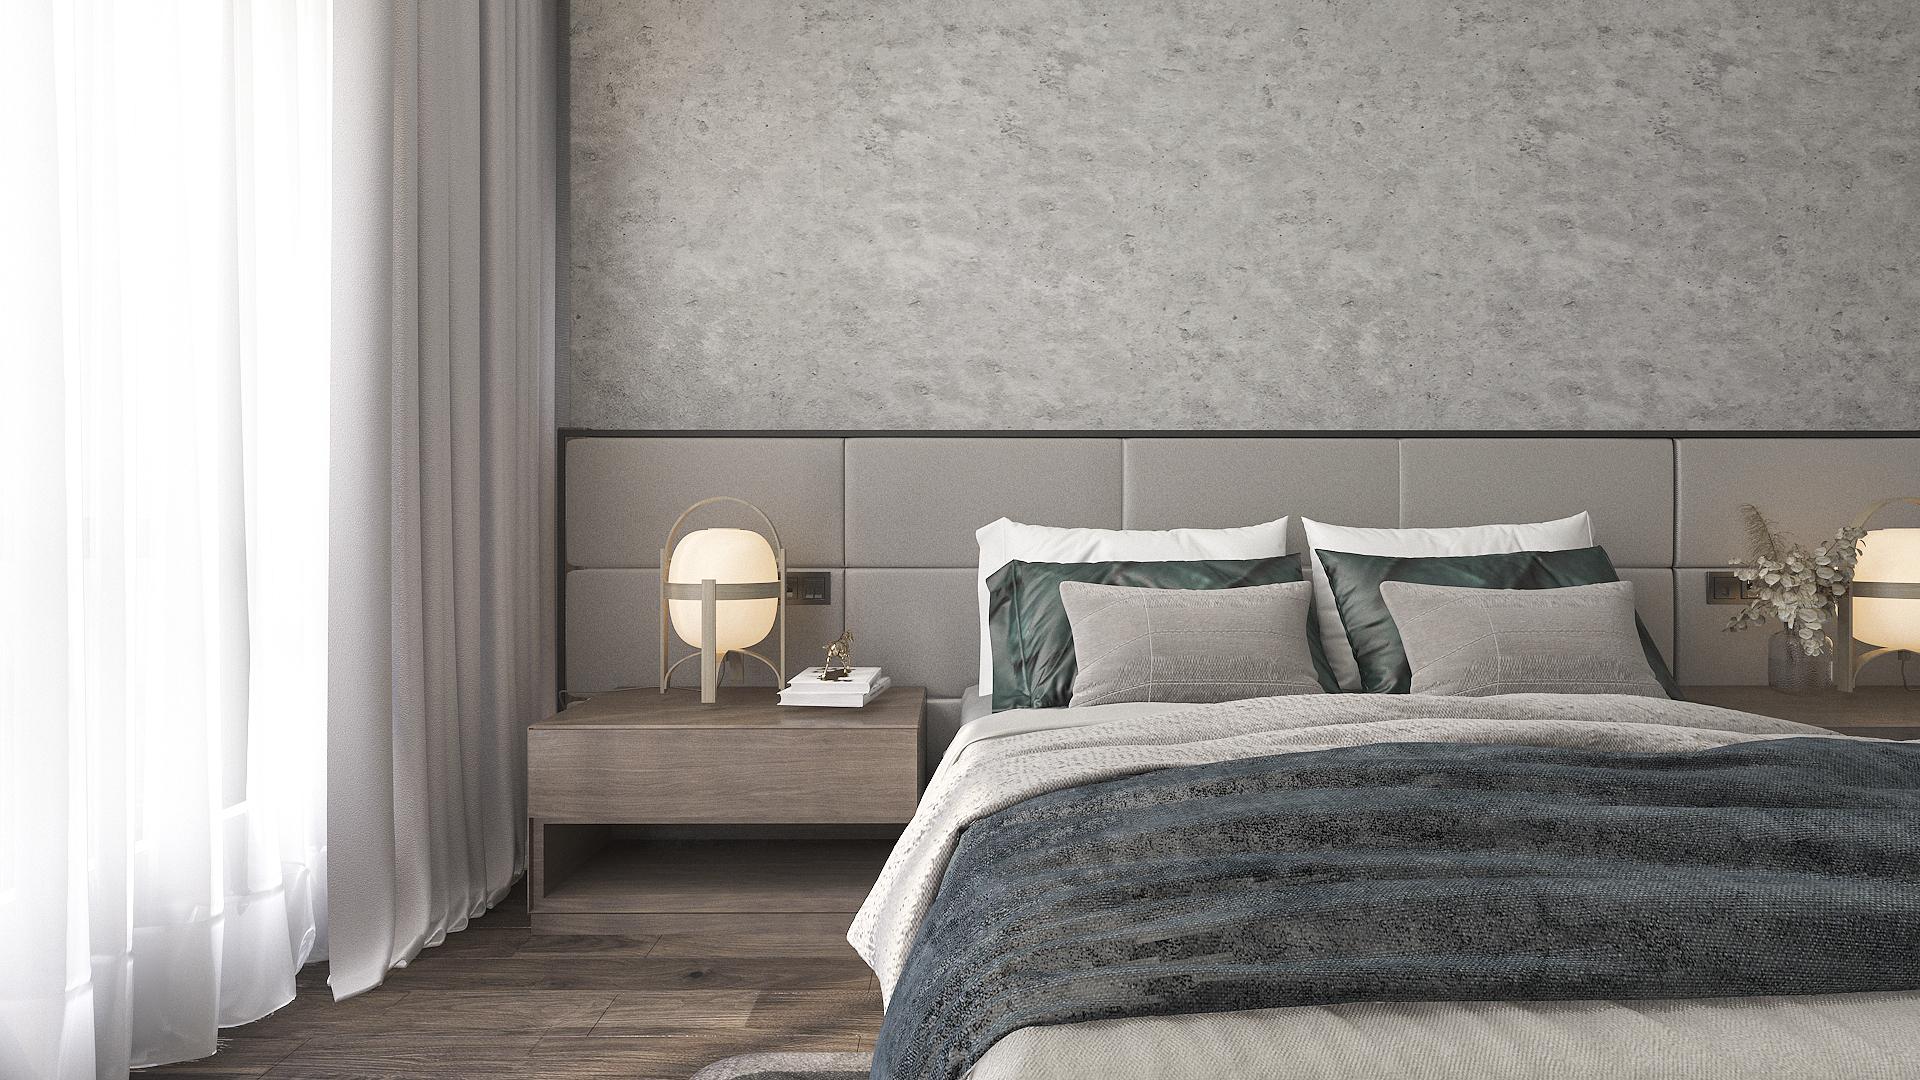 apartment-bedroom-01